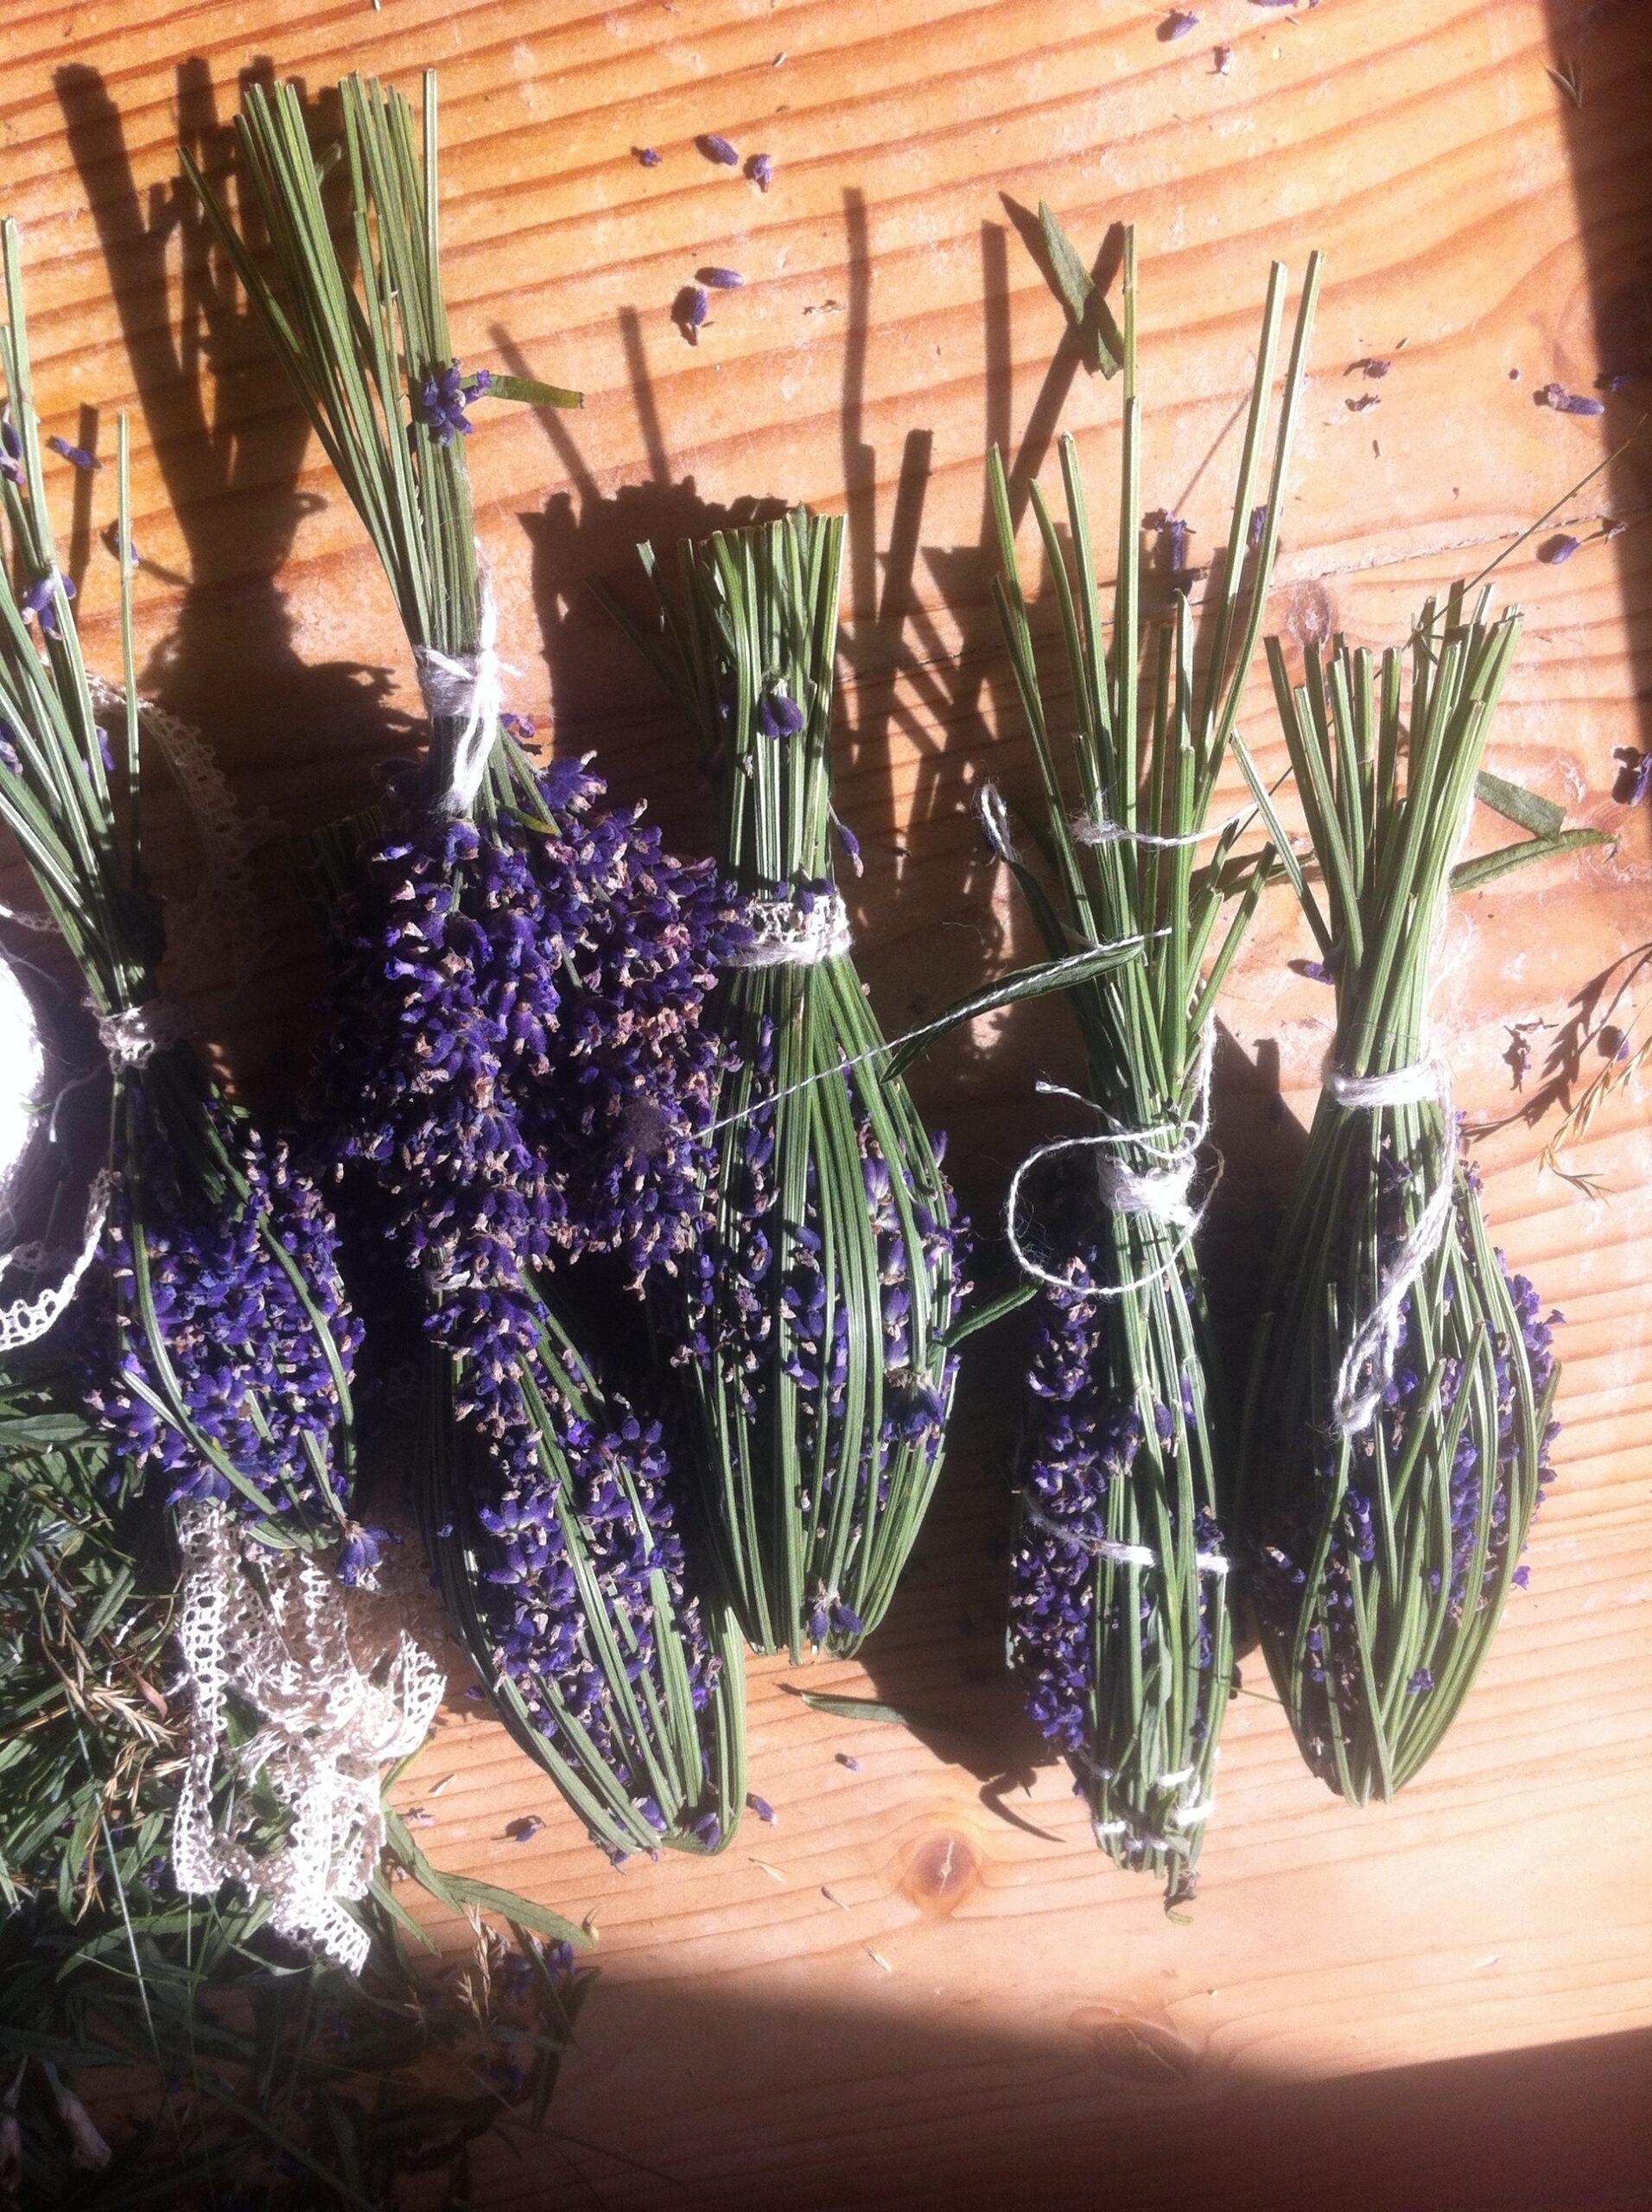 Lavendelposer